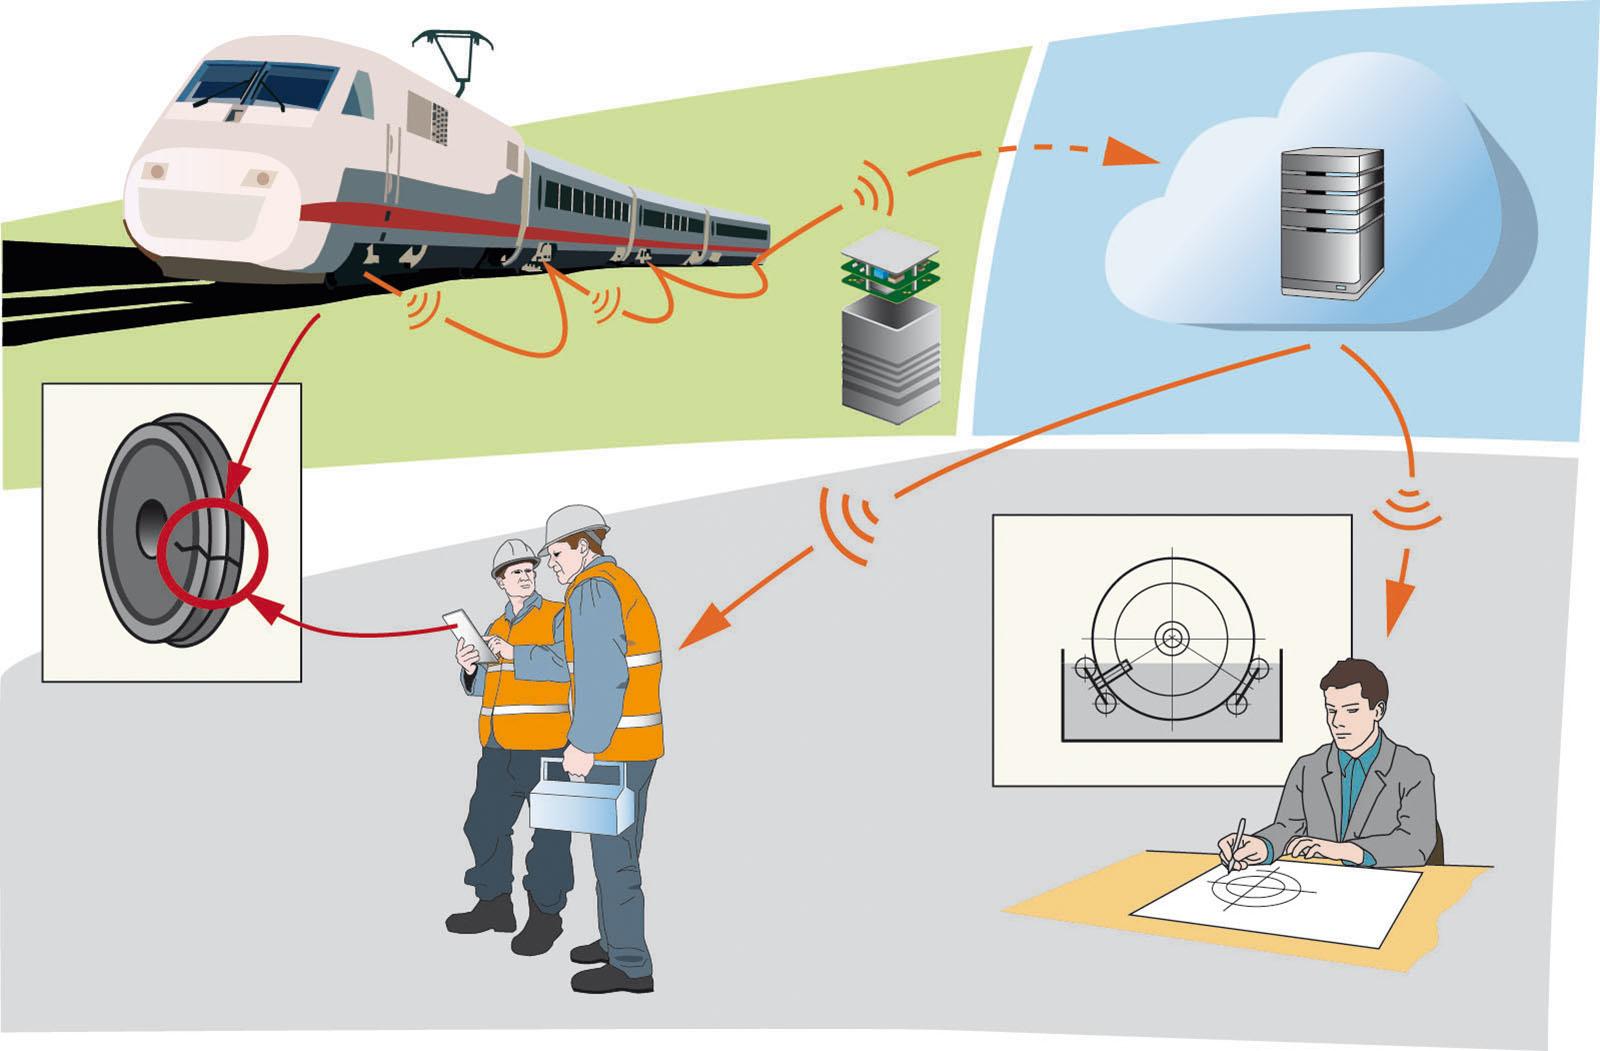 Sensors That Improve Rail Transport Safety